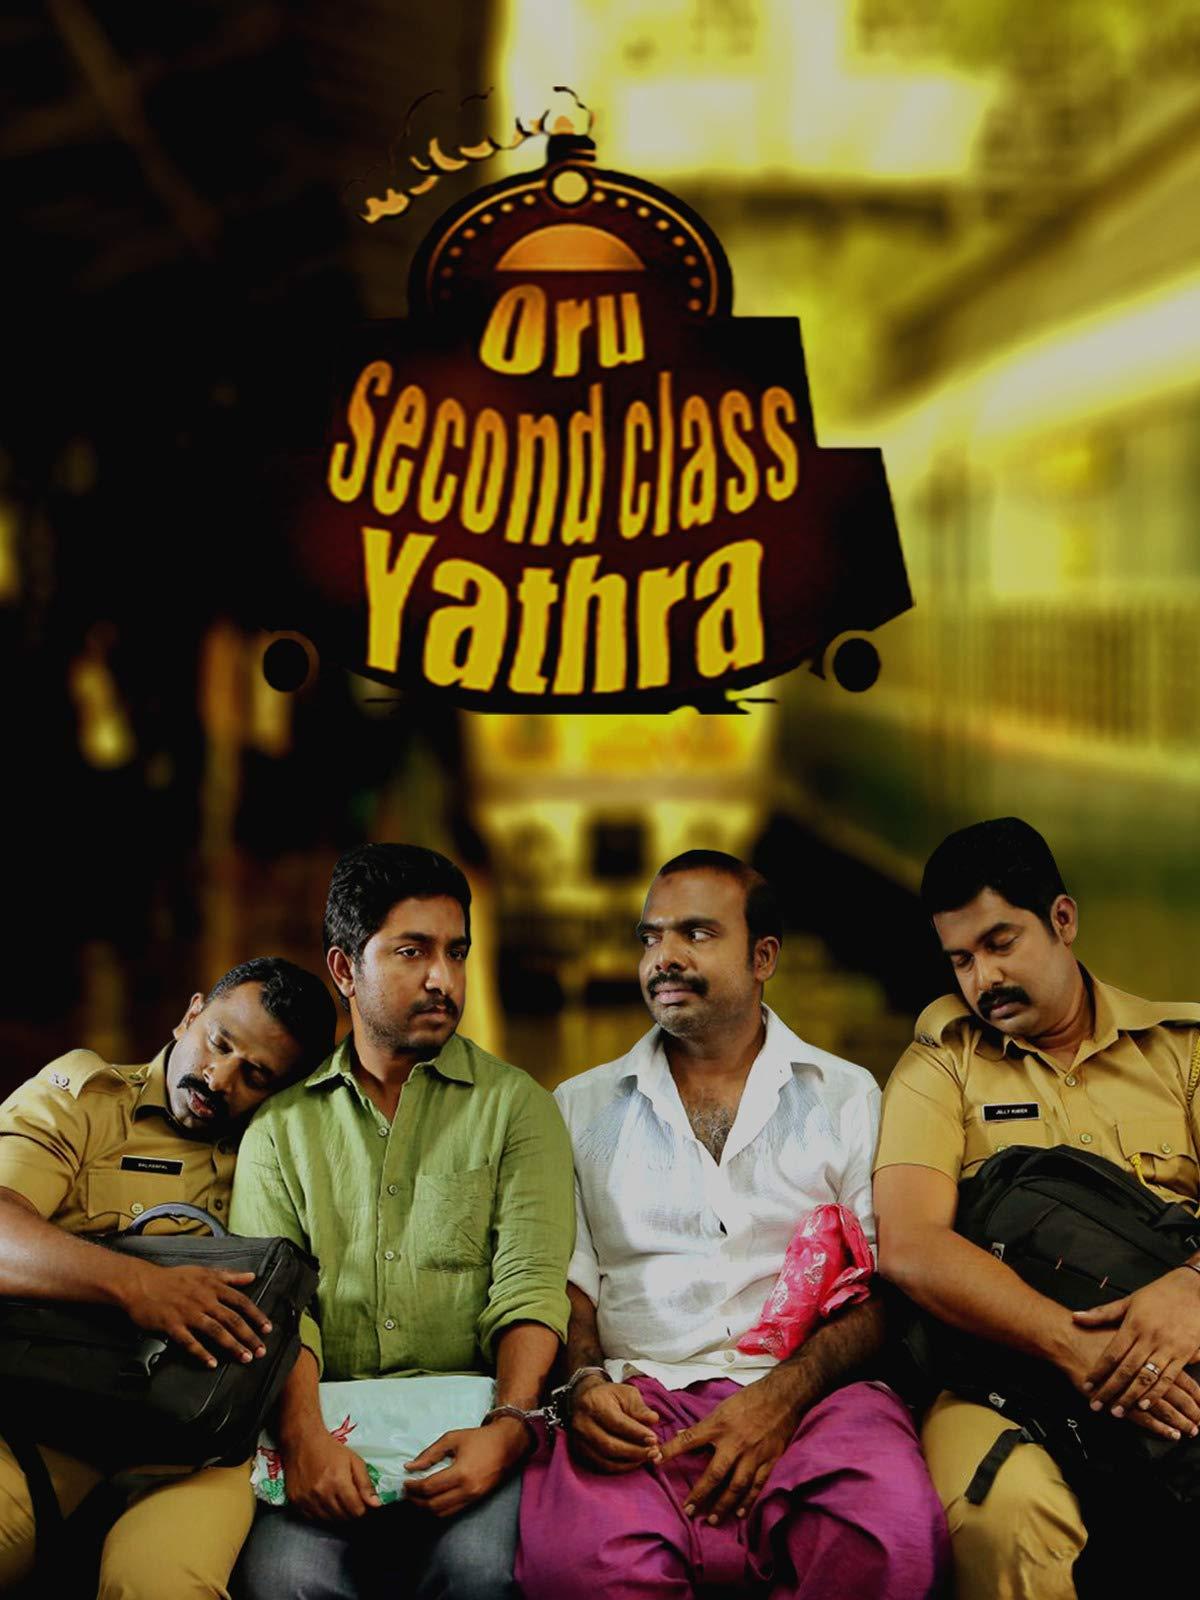 Oru Second Class Yathra